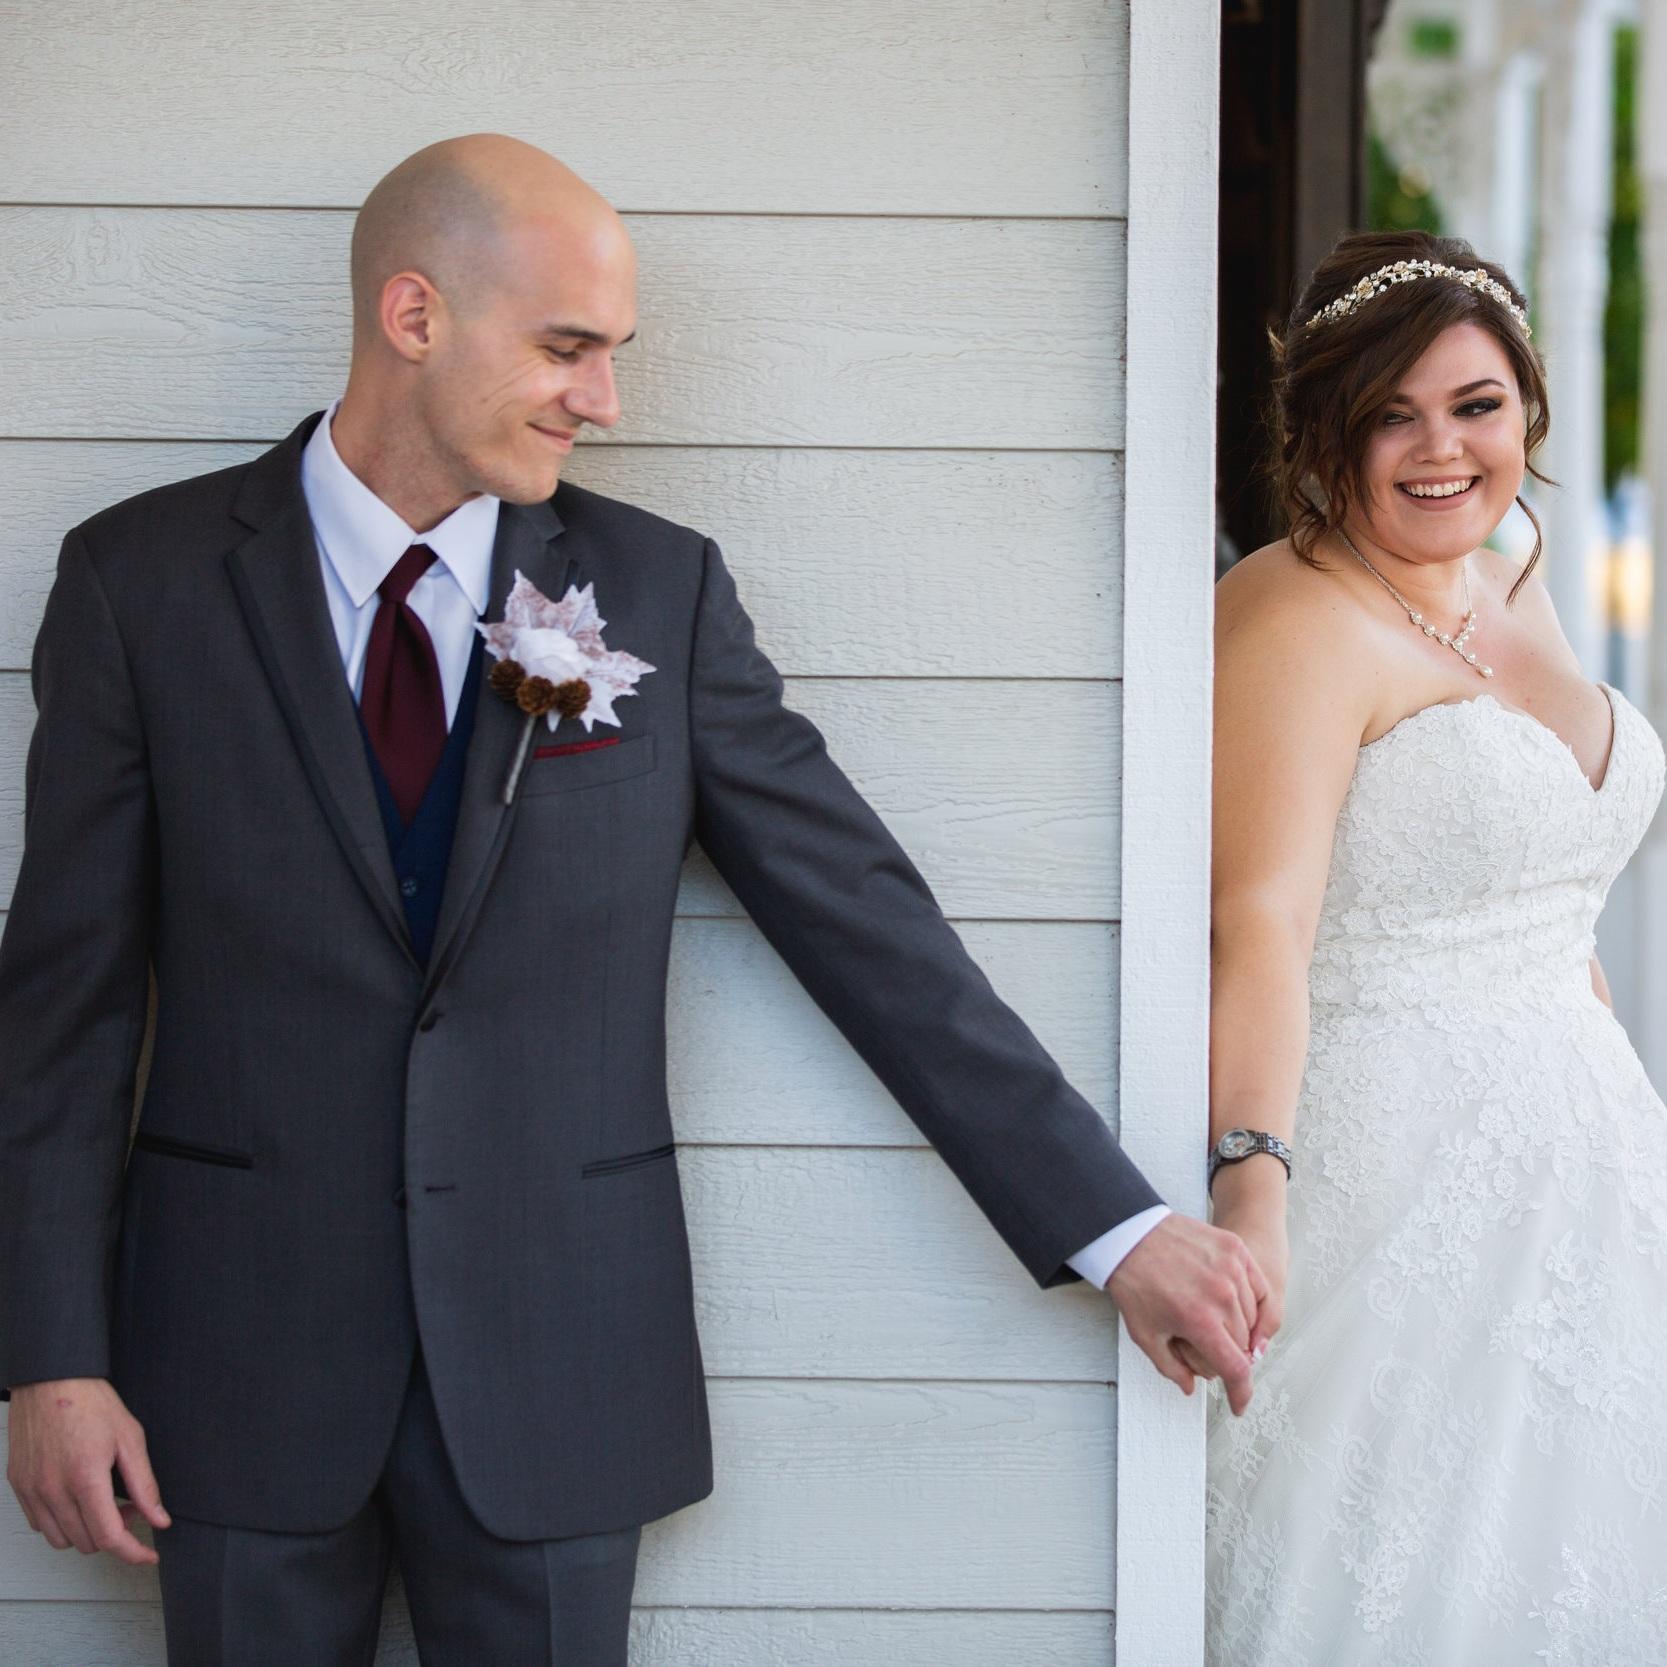 kaleigh & Eric - Wedding Photos